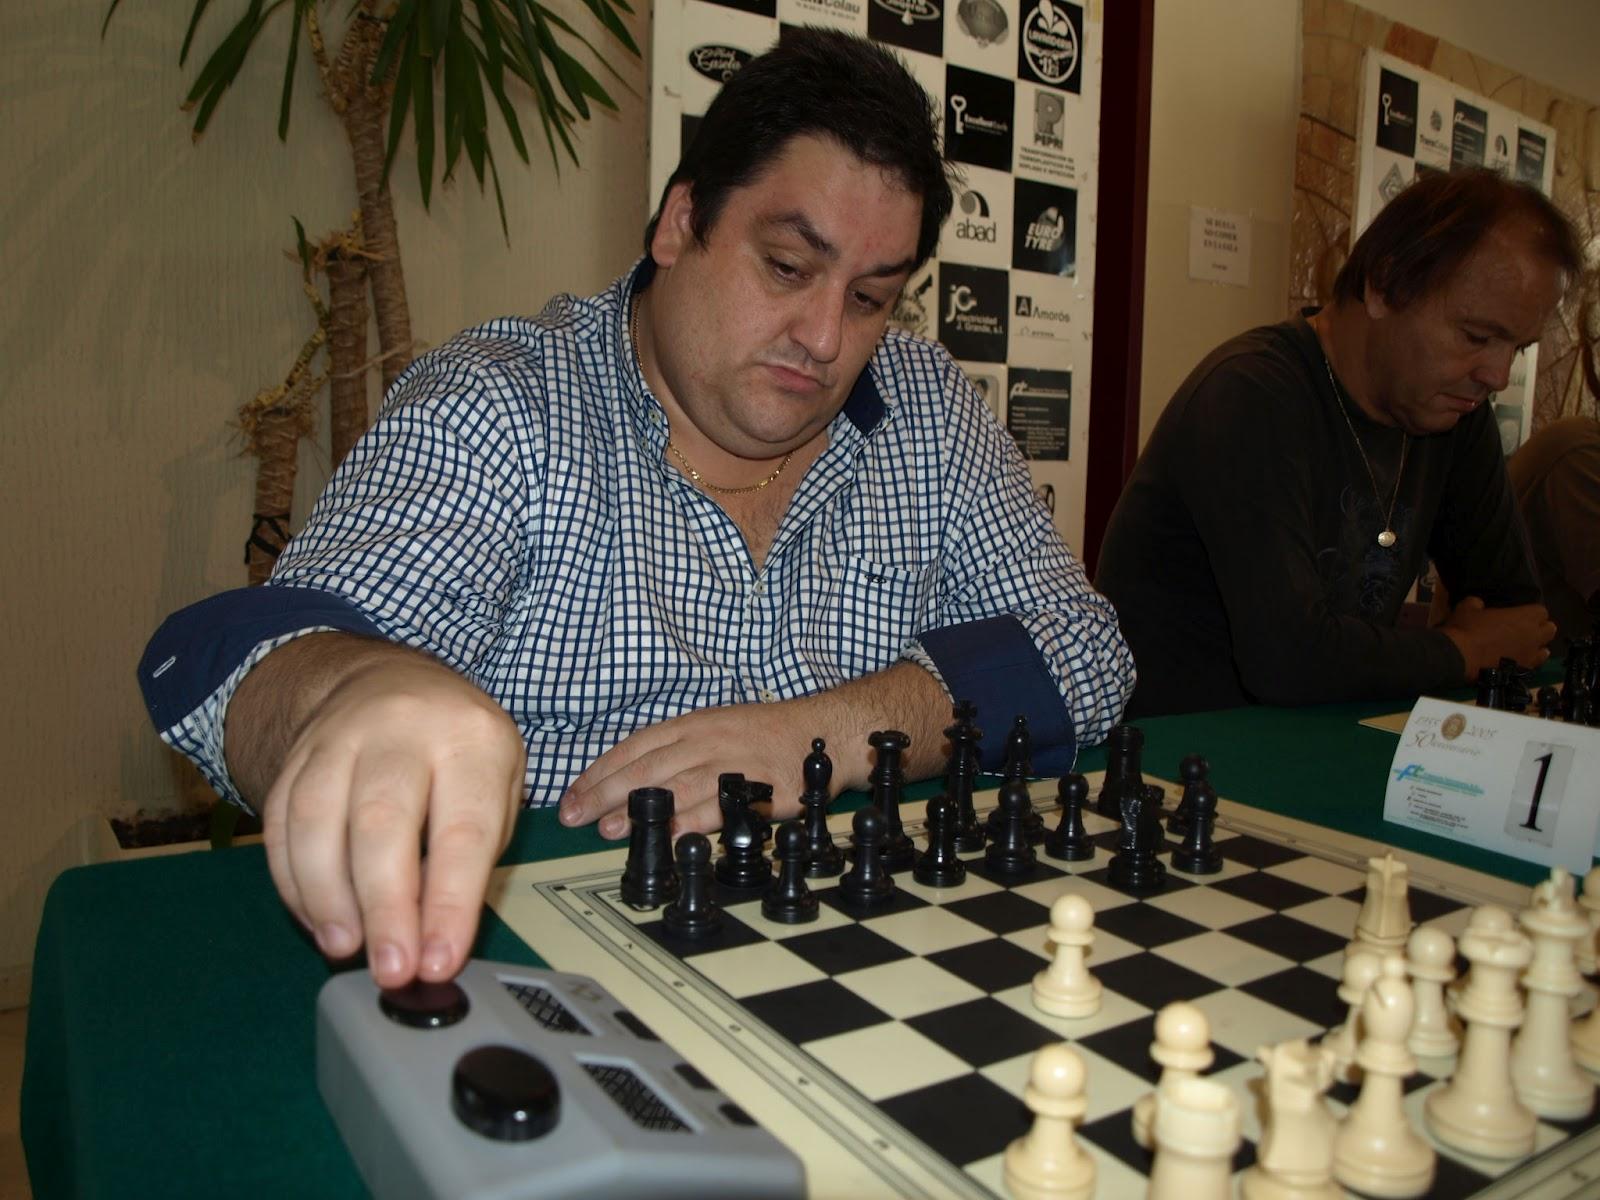 Antonio Granero Roca